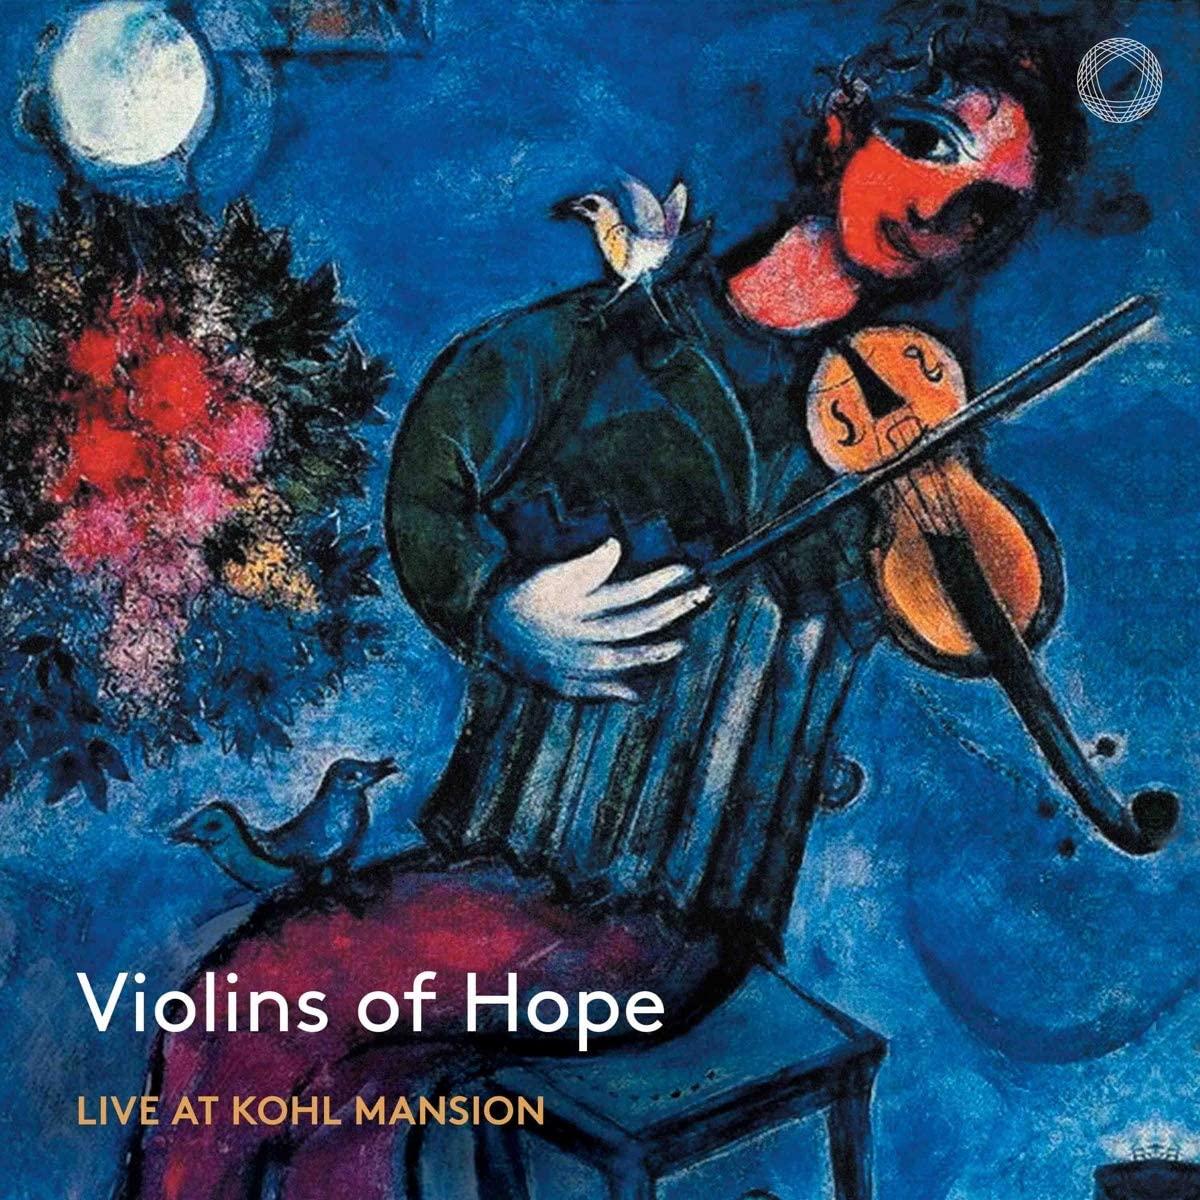 Review of Violins of Hope: Heggie, Schubert & Mendelssohn